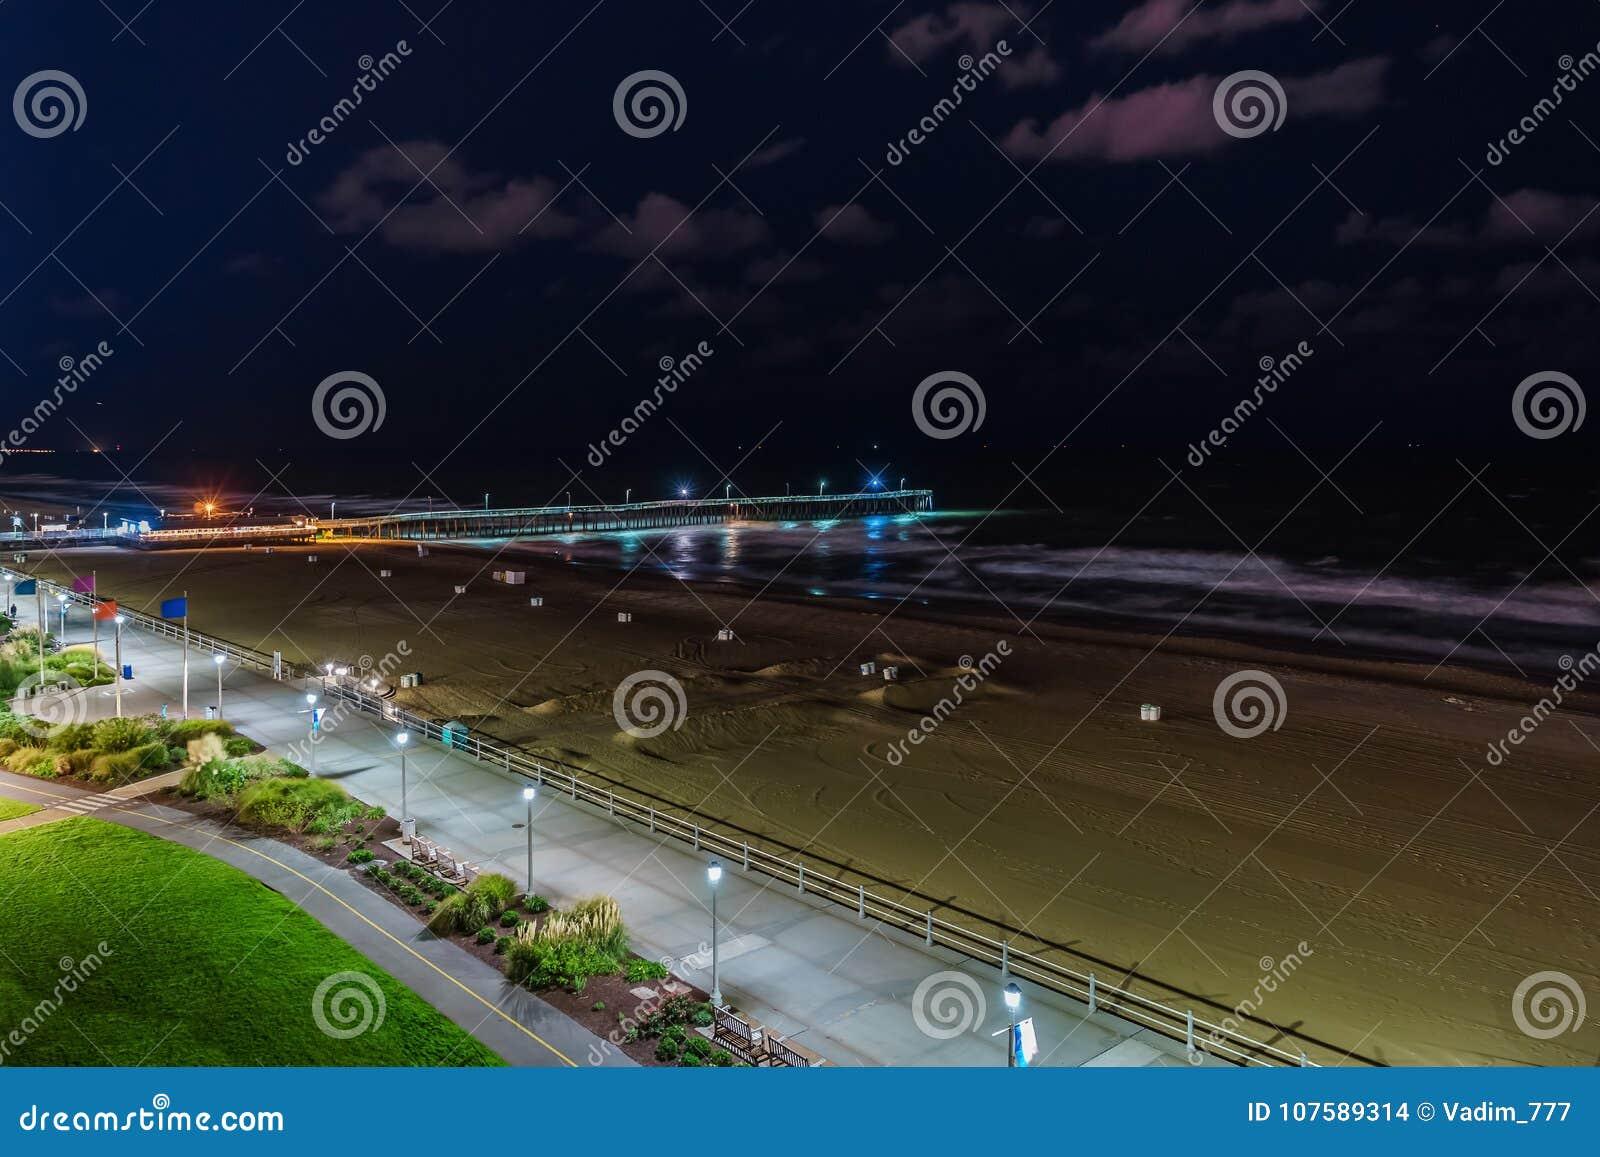 Virginia Beach Fishing Pier And Boardwalk Virginia Beach At Night Virginia Stock Photo Image Of Night Shore 107589314